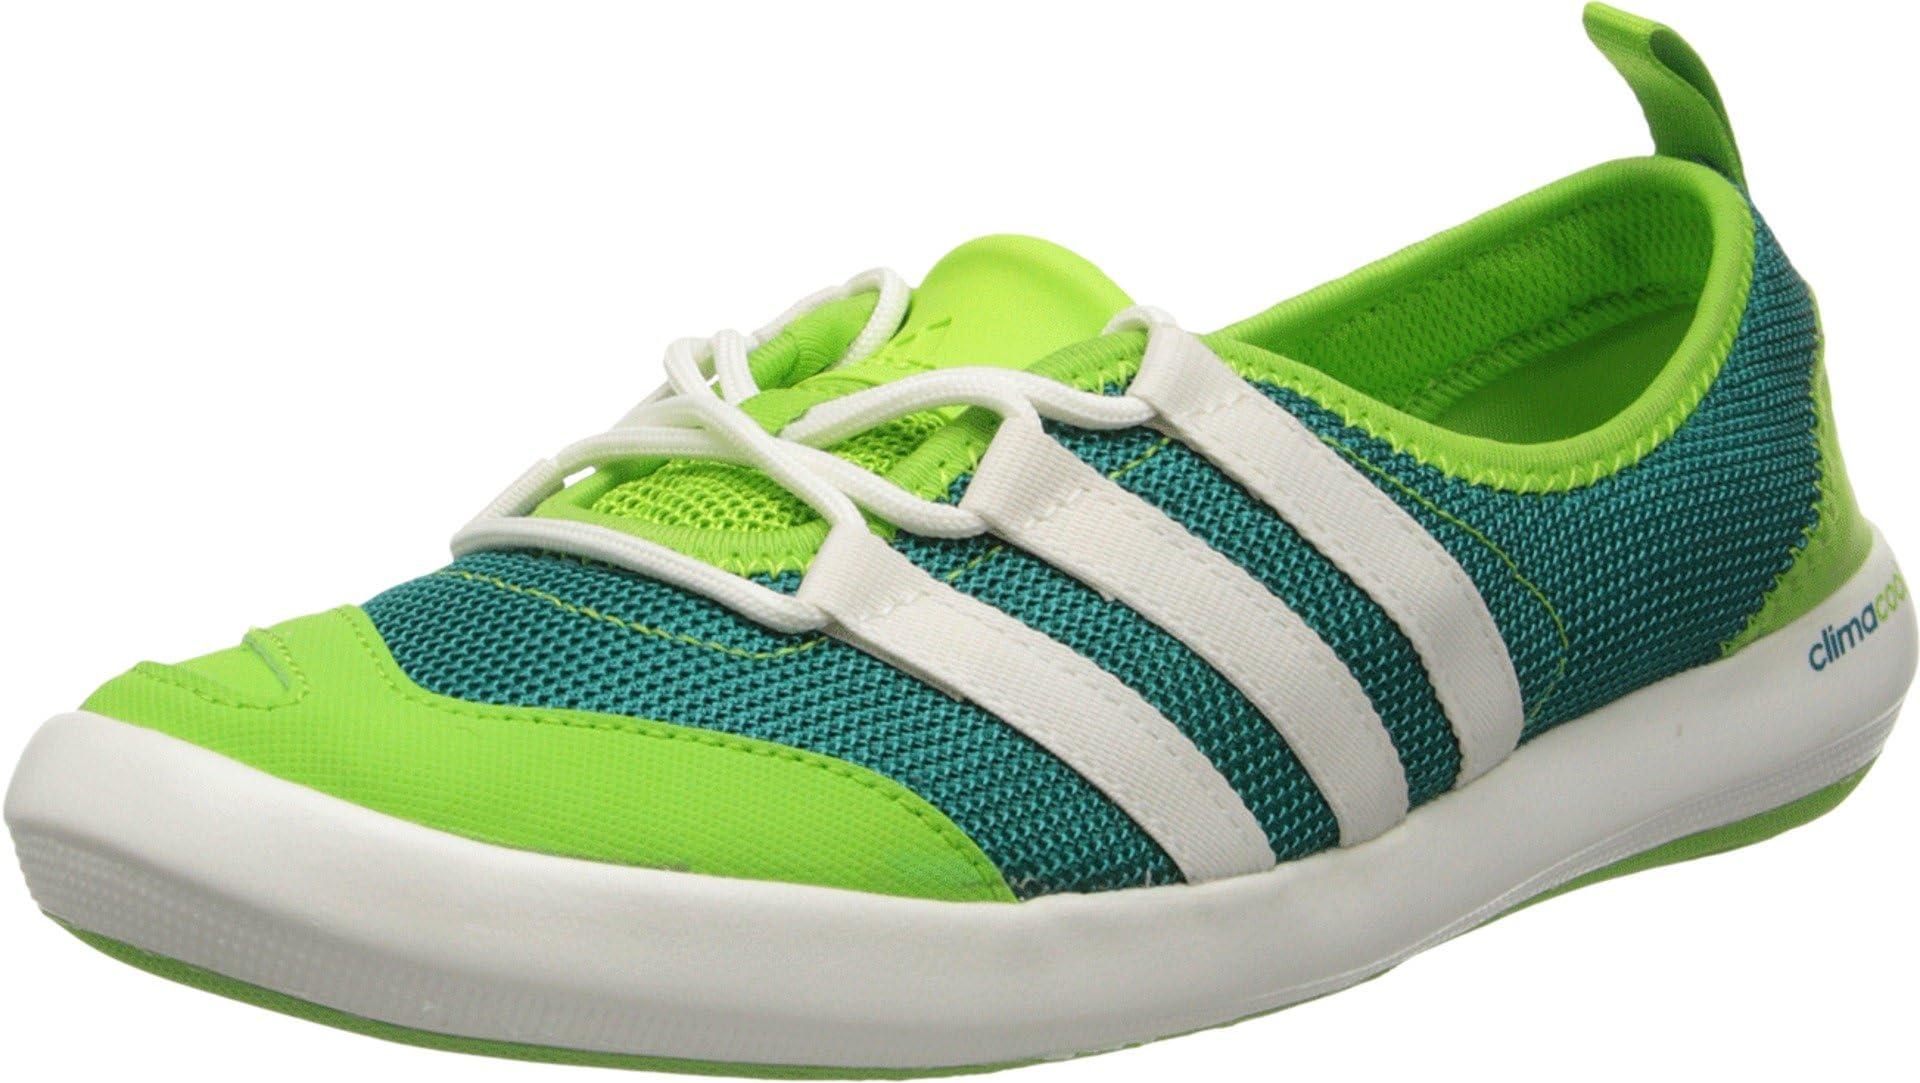 Amazon.com: adidas outdoor Women's Climacool? Boat Sleek Semi ...